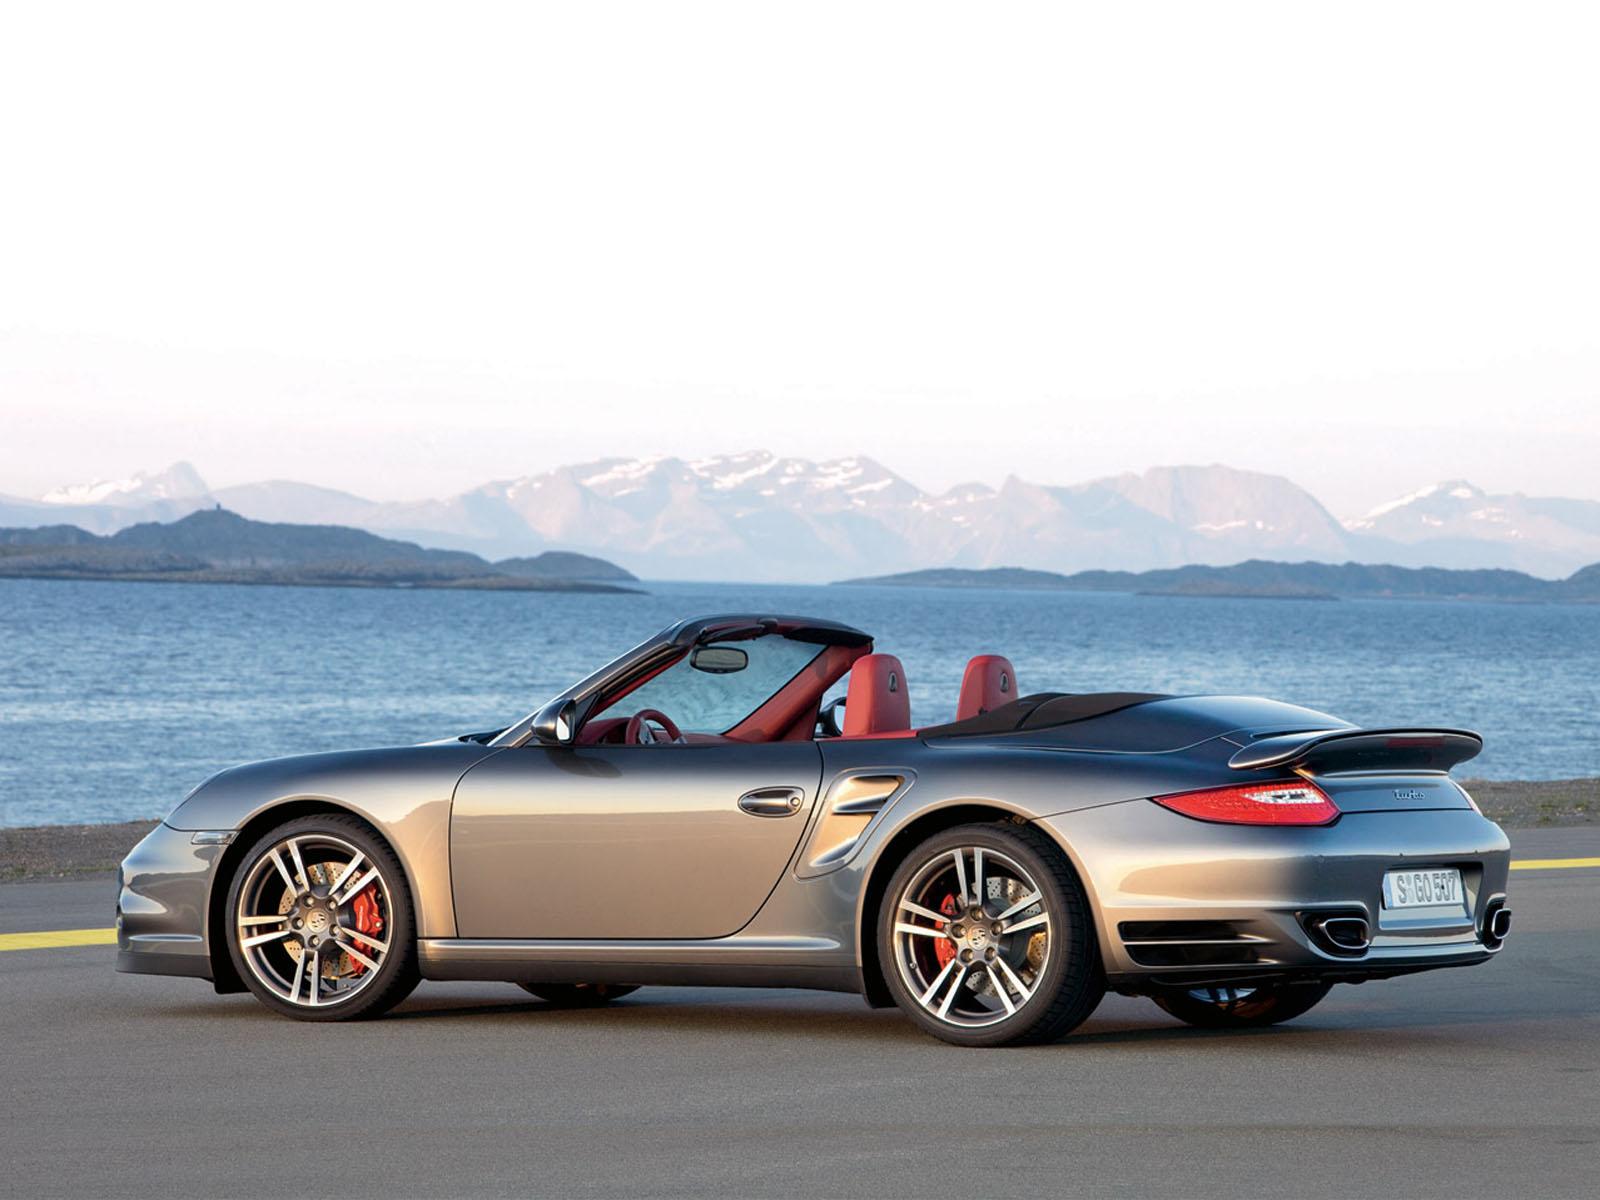 Wallpapers Porsche 911 Turbo Car Wallpapers